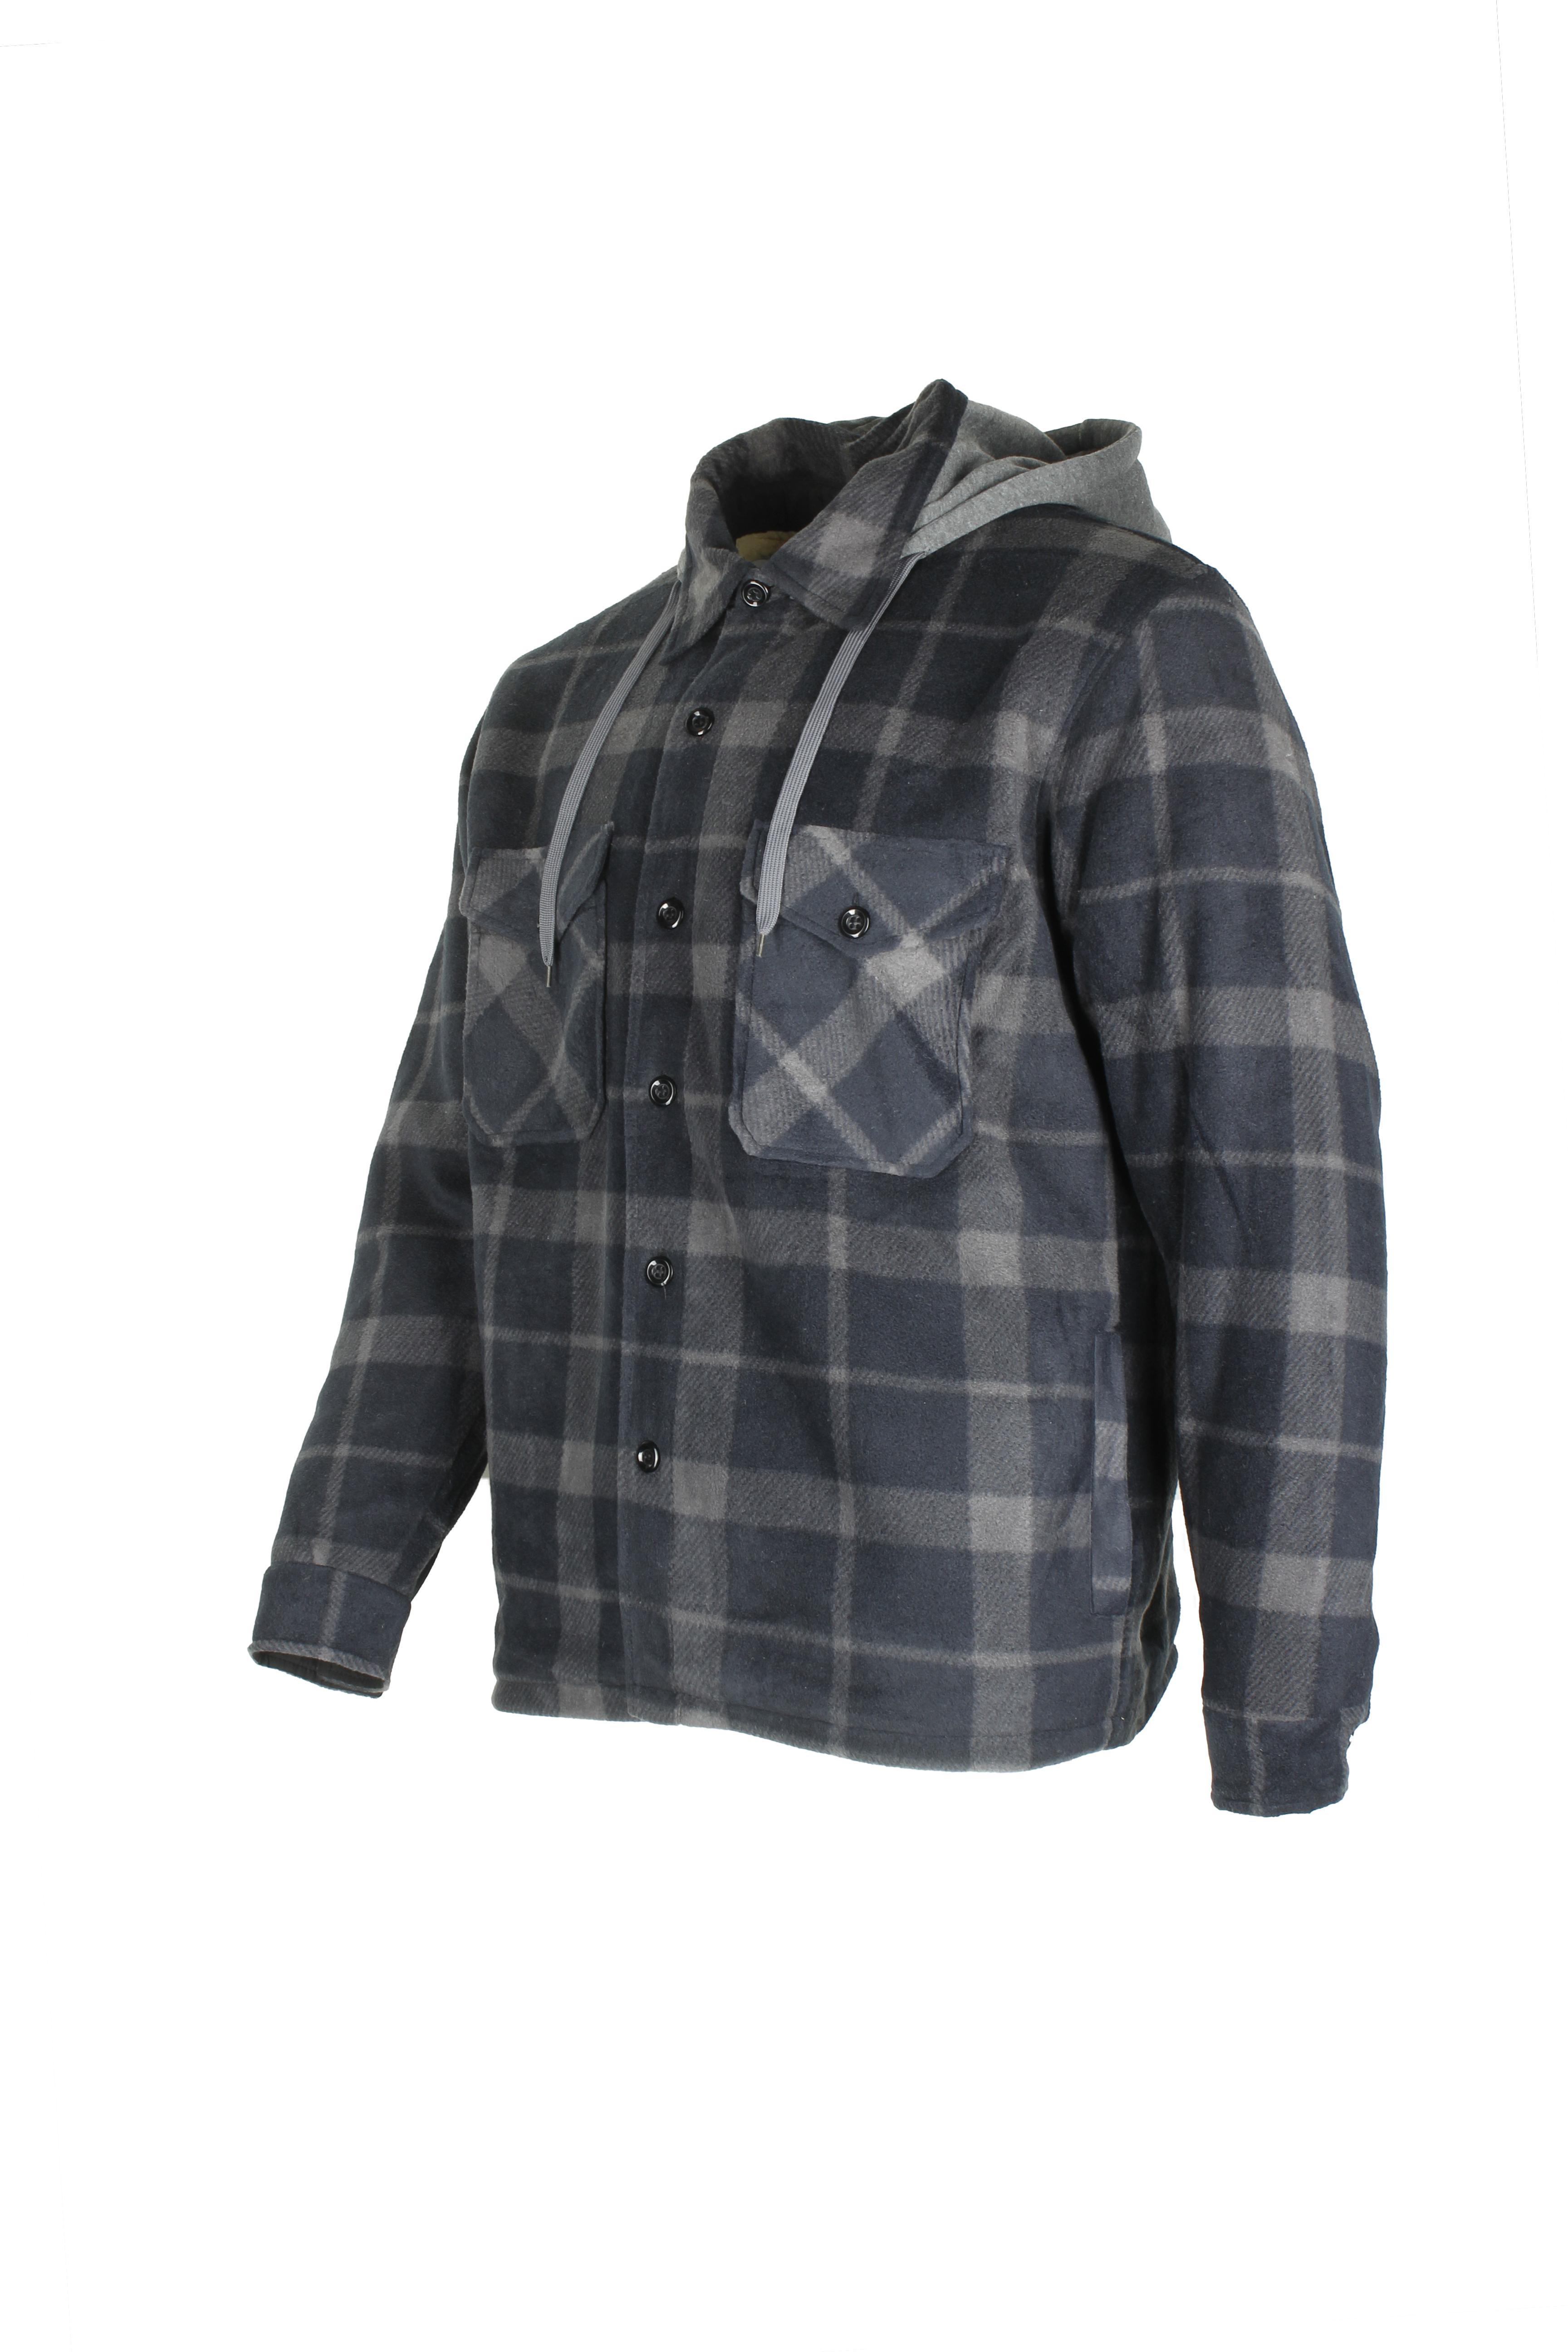 Maxxsel-Men-039-s-Sherpa-Lined-Plaid-Polar-Fleece-Flannel-Zip-Up-Hooded-Shirt-Jacket thumbnail 3